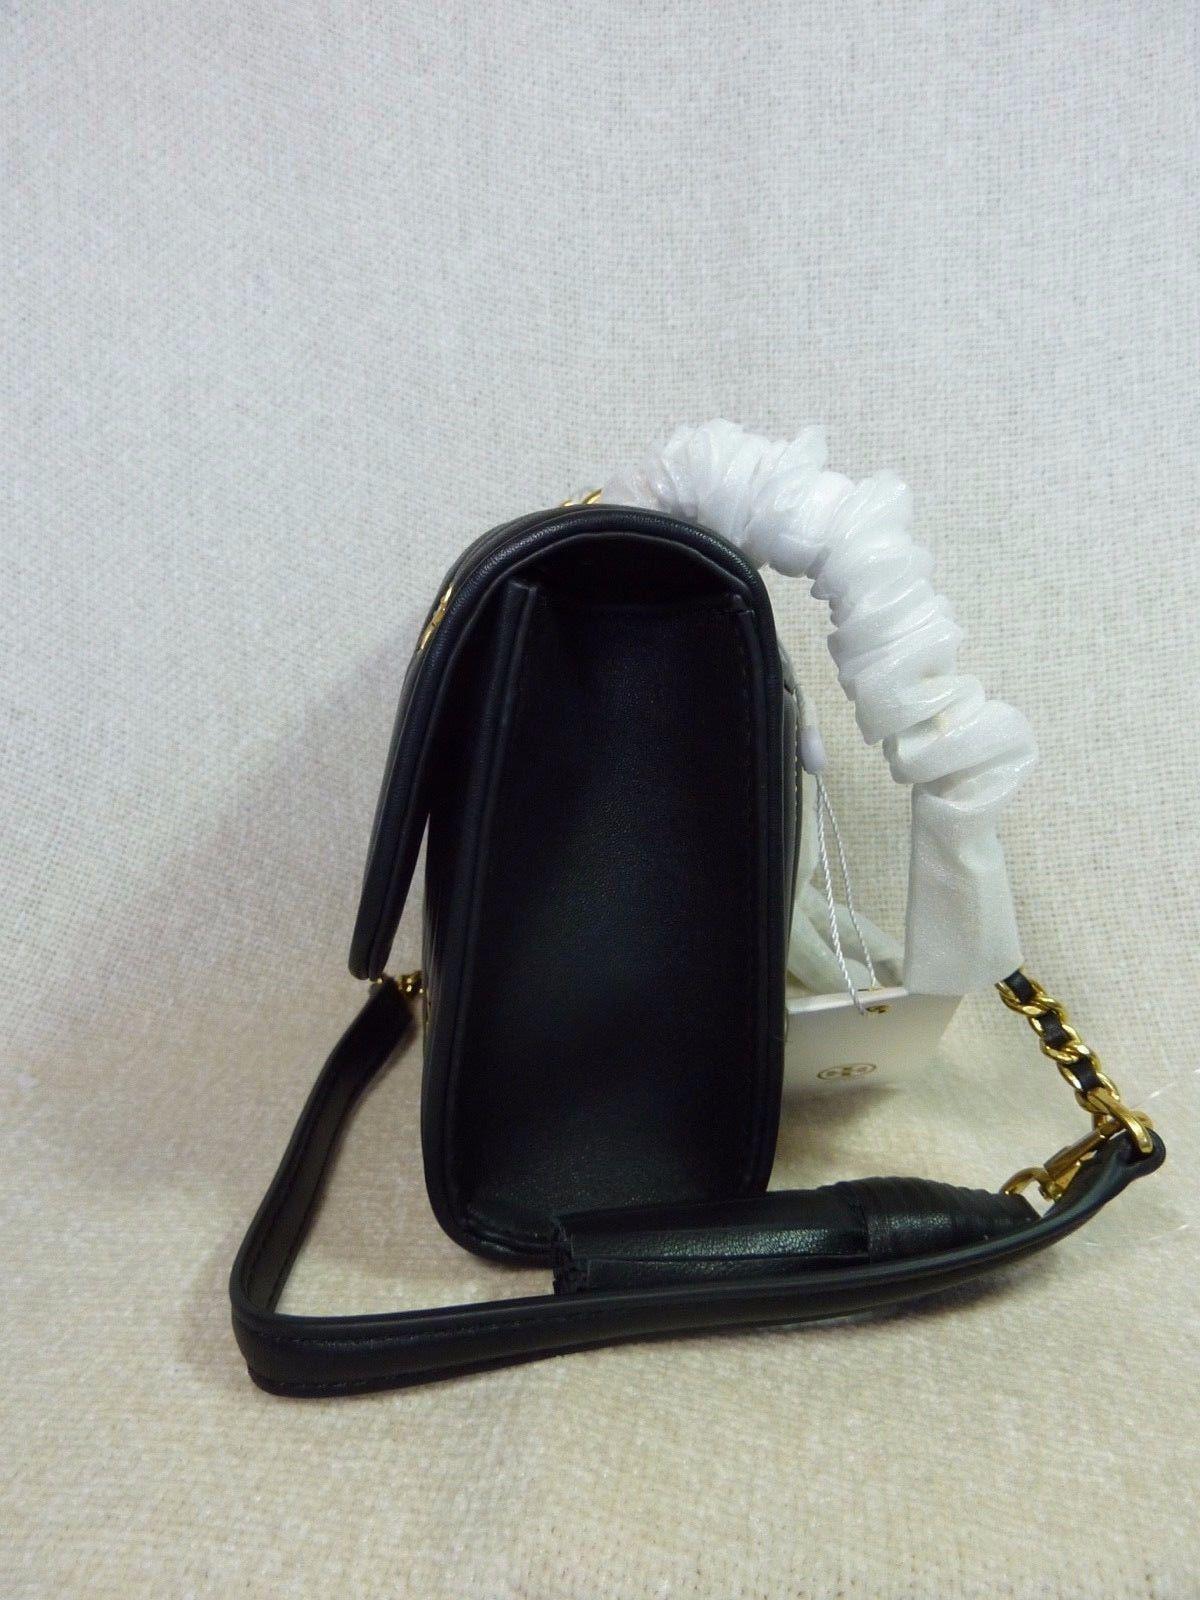 NWT Tory Burch Black Fleming Star-Stud Small Convertible Bag $558 image 3